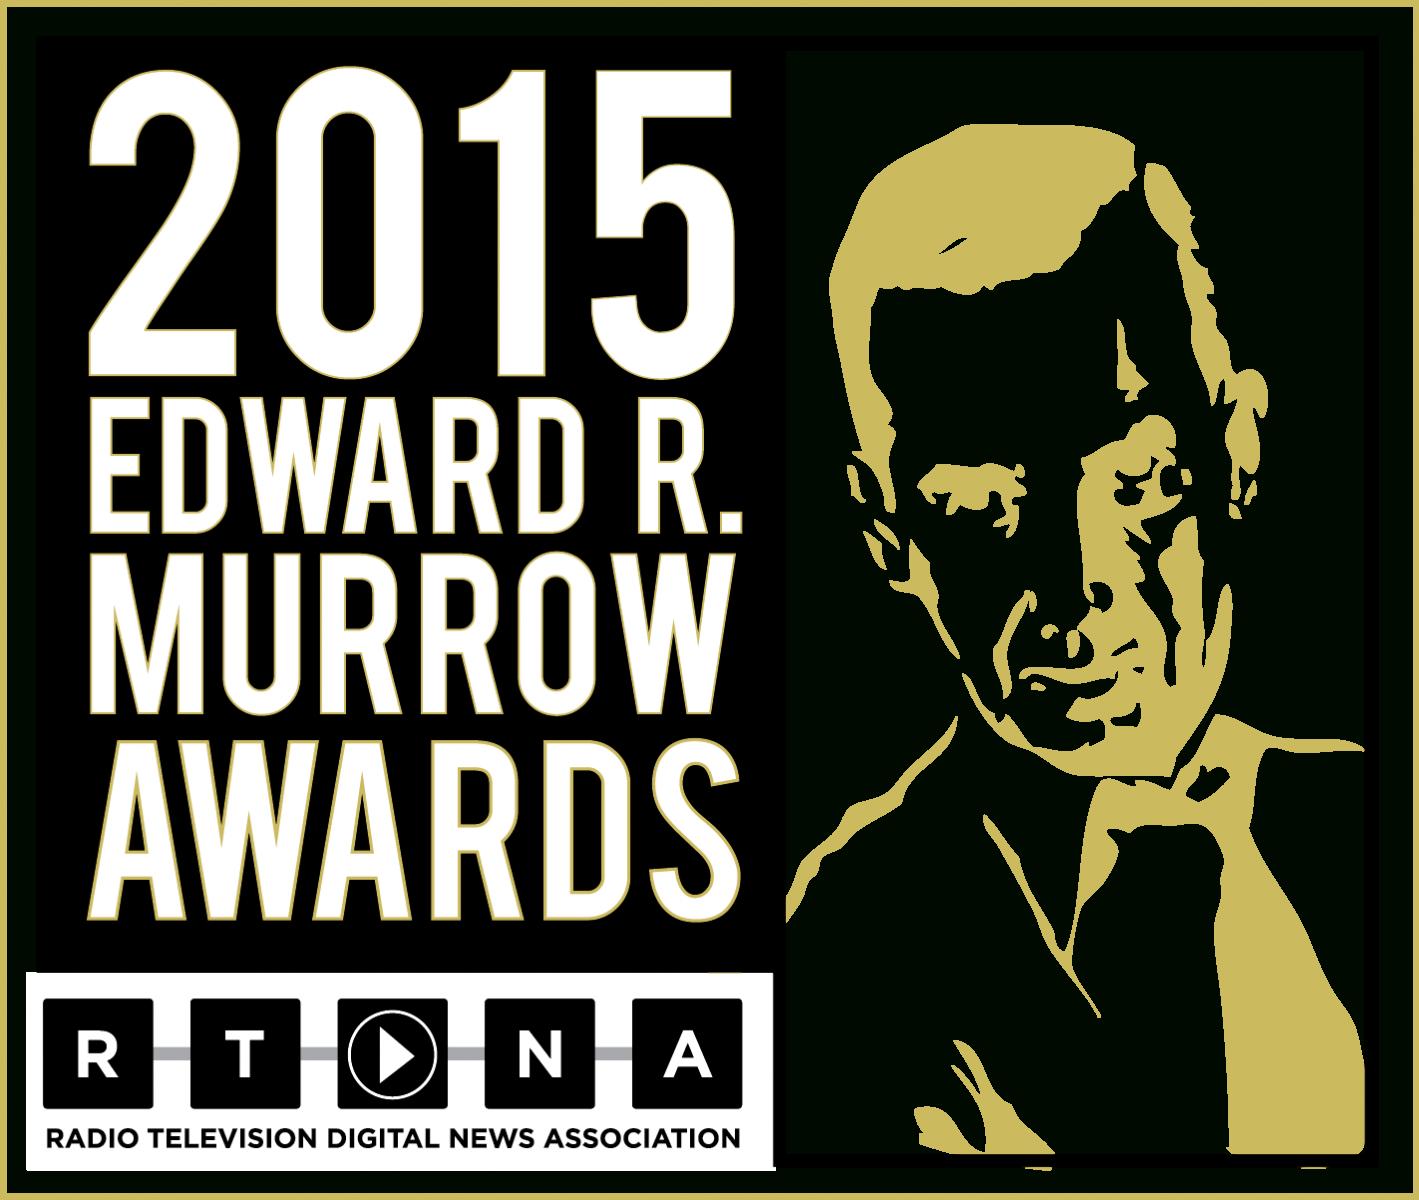 Kazu Honored With Four 2015 Edward R. Murrow Awards   90.3 Within Edward R Murrow Calendar